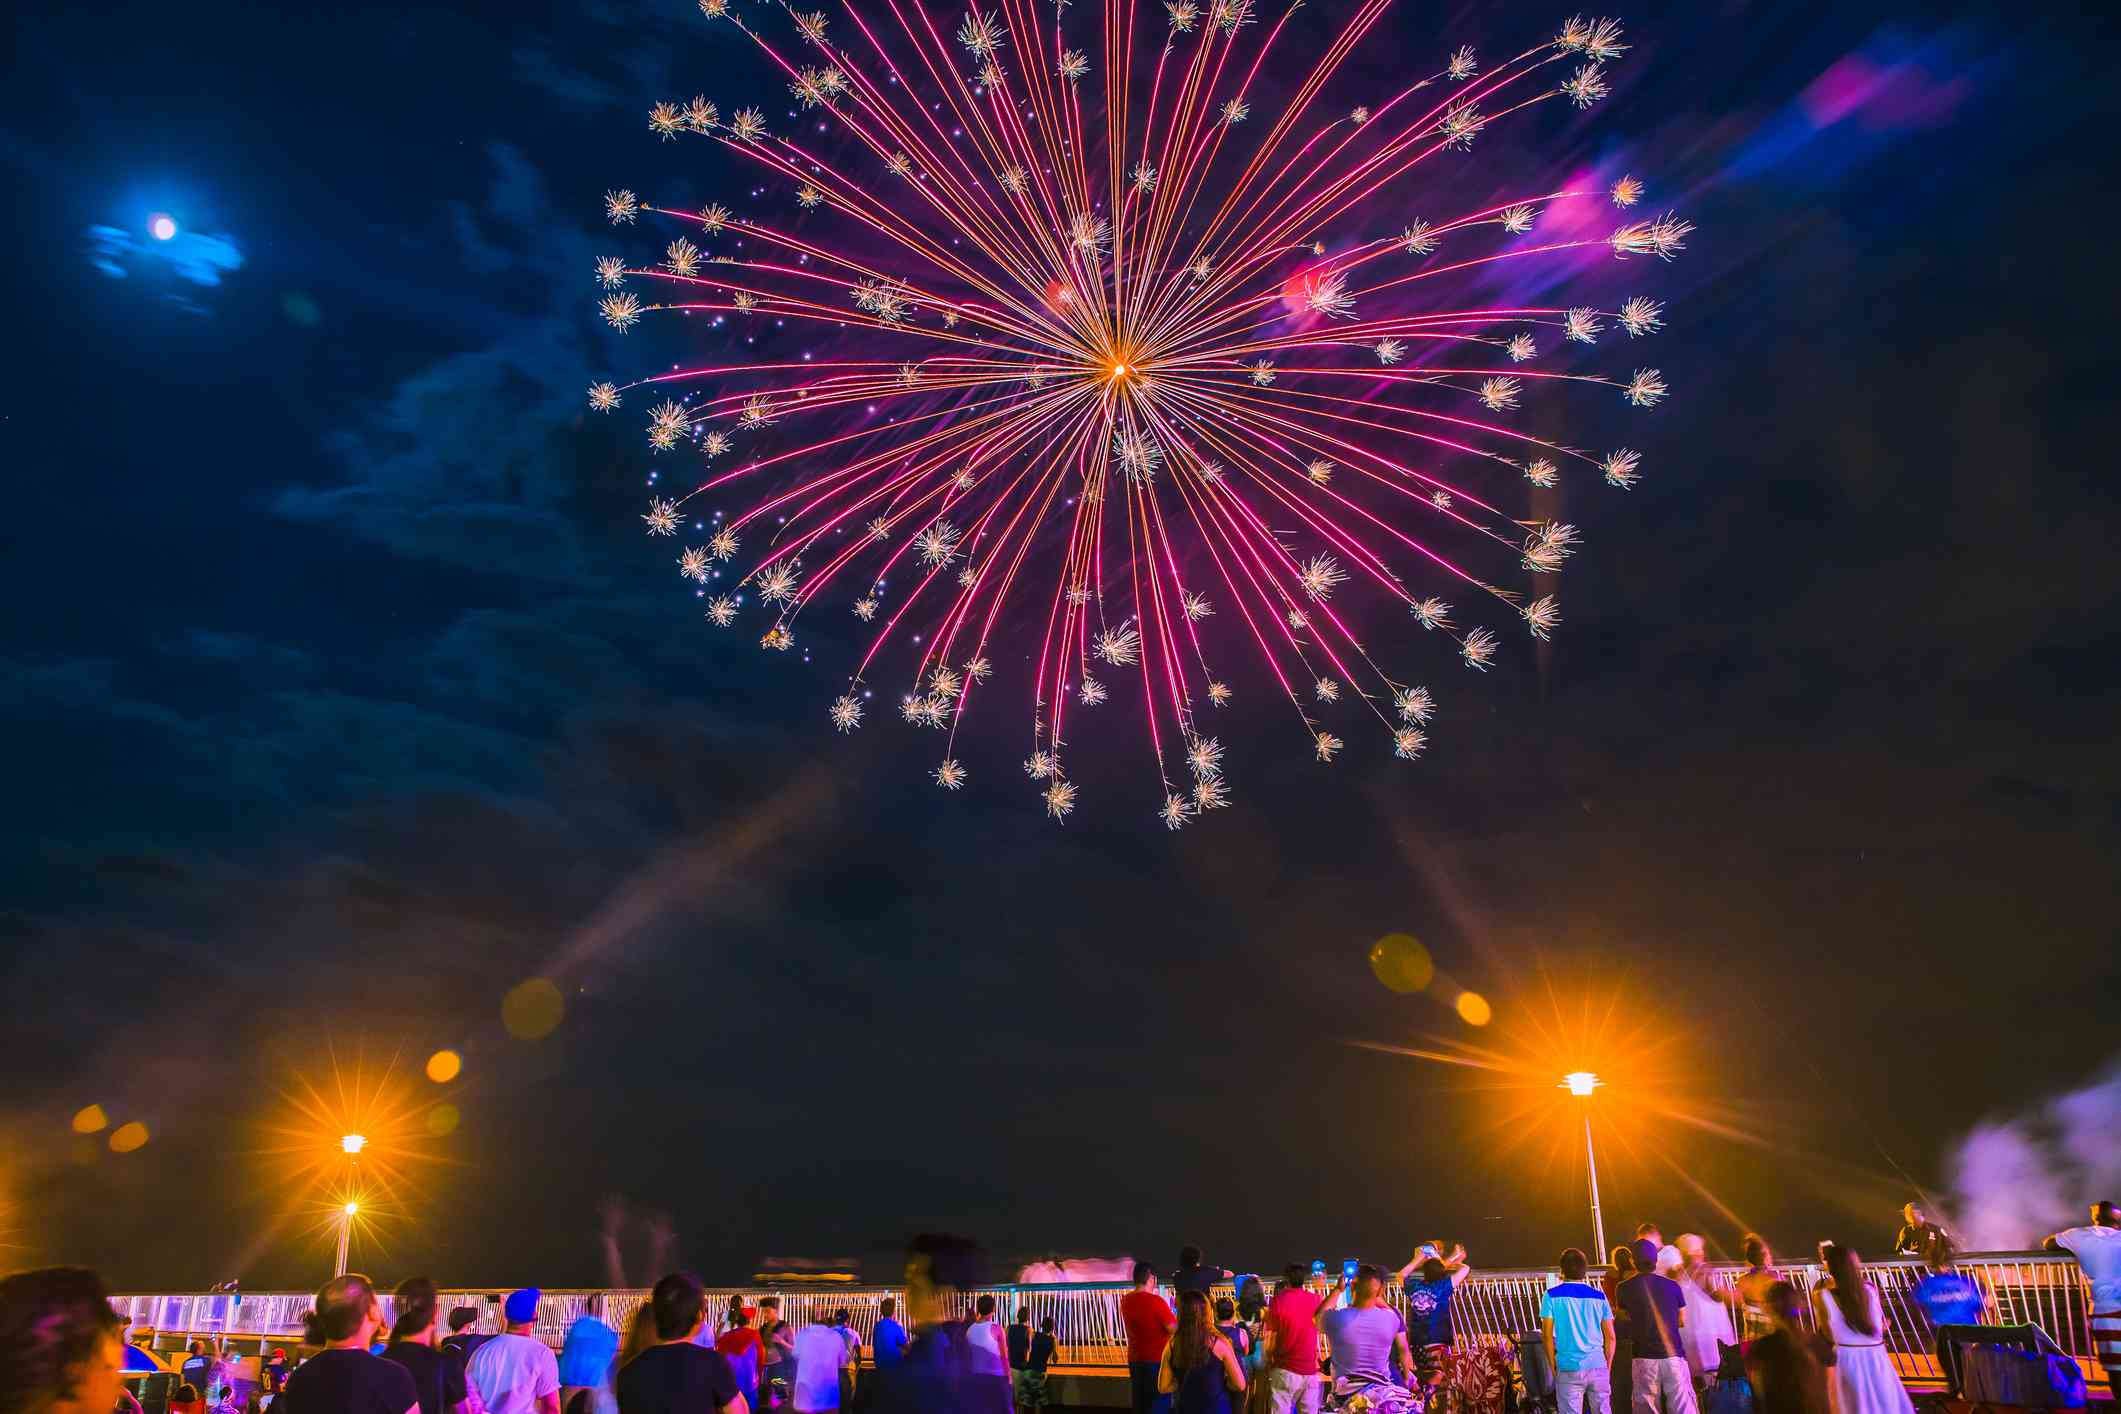 New York Fireworks on Coney Island